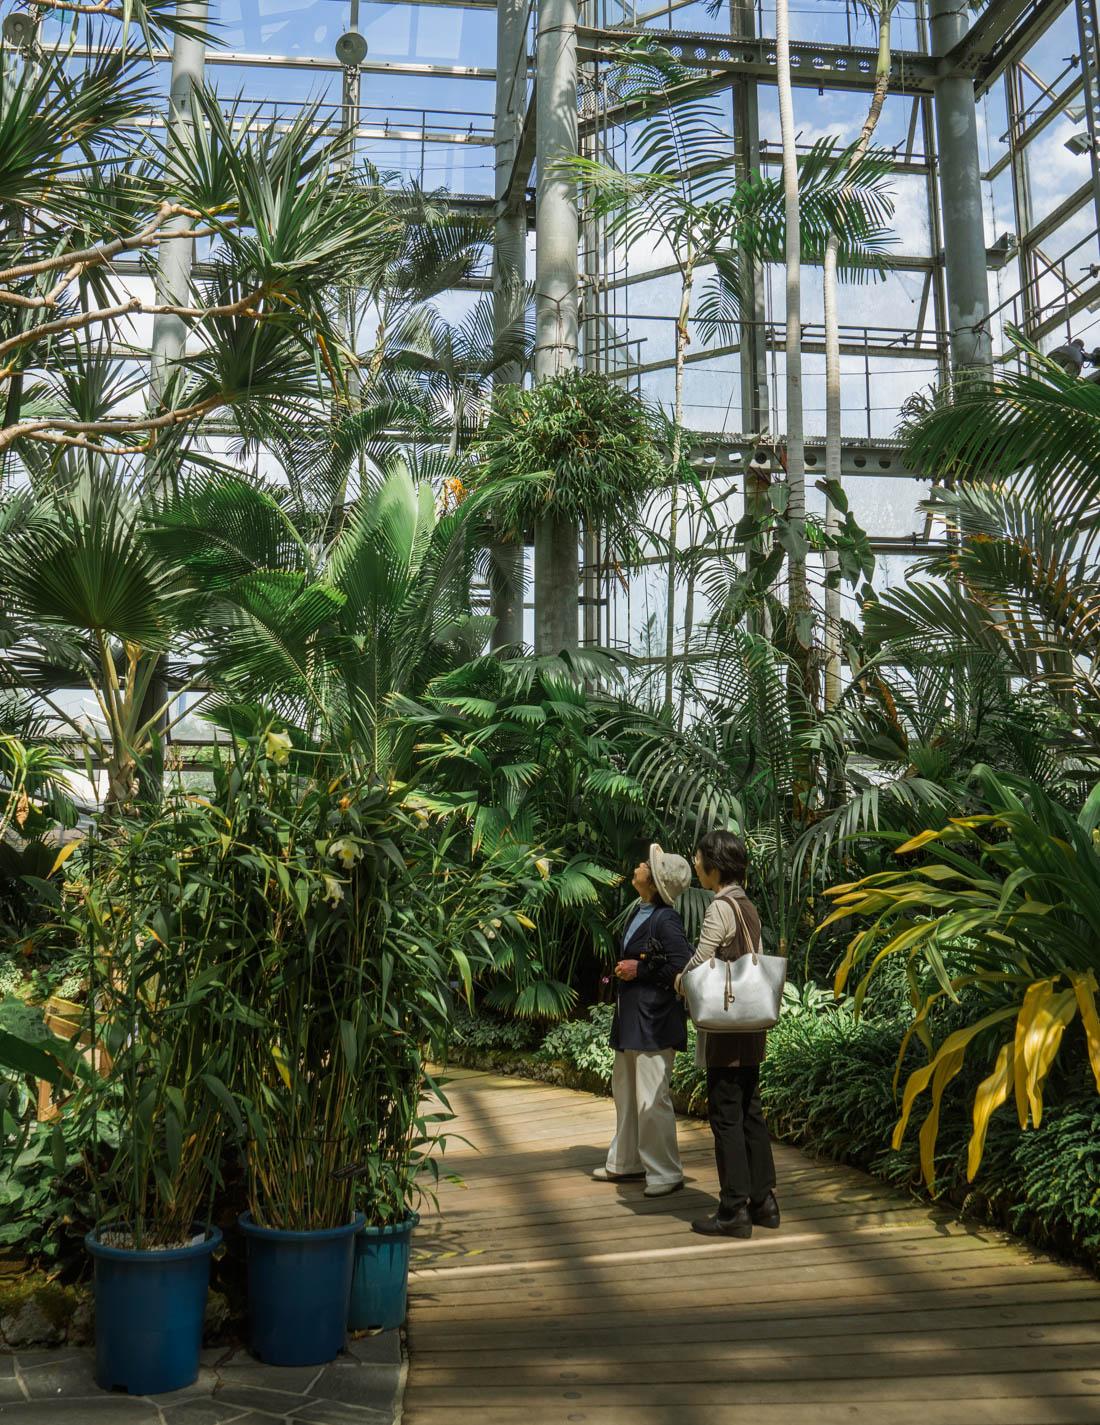 Tsurumiryokuchi Expo '90 Commemorative Park Botanical Garden